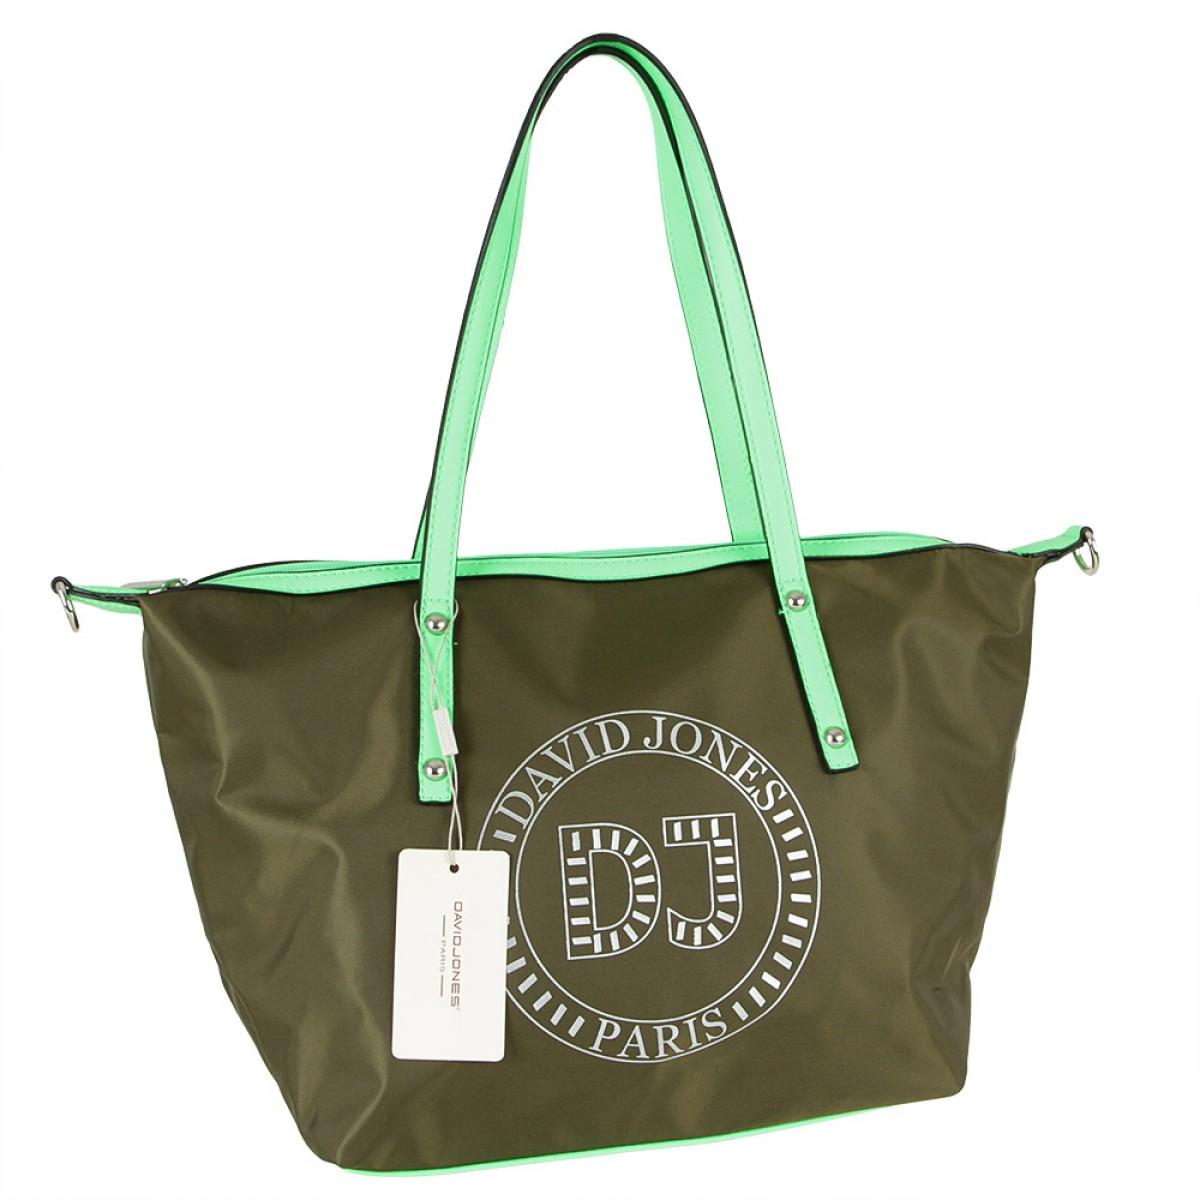 Жіноча сумка David Jones  6271-2 VERT